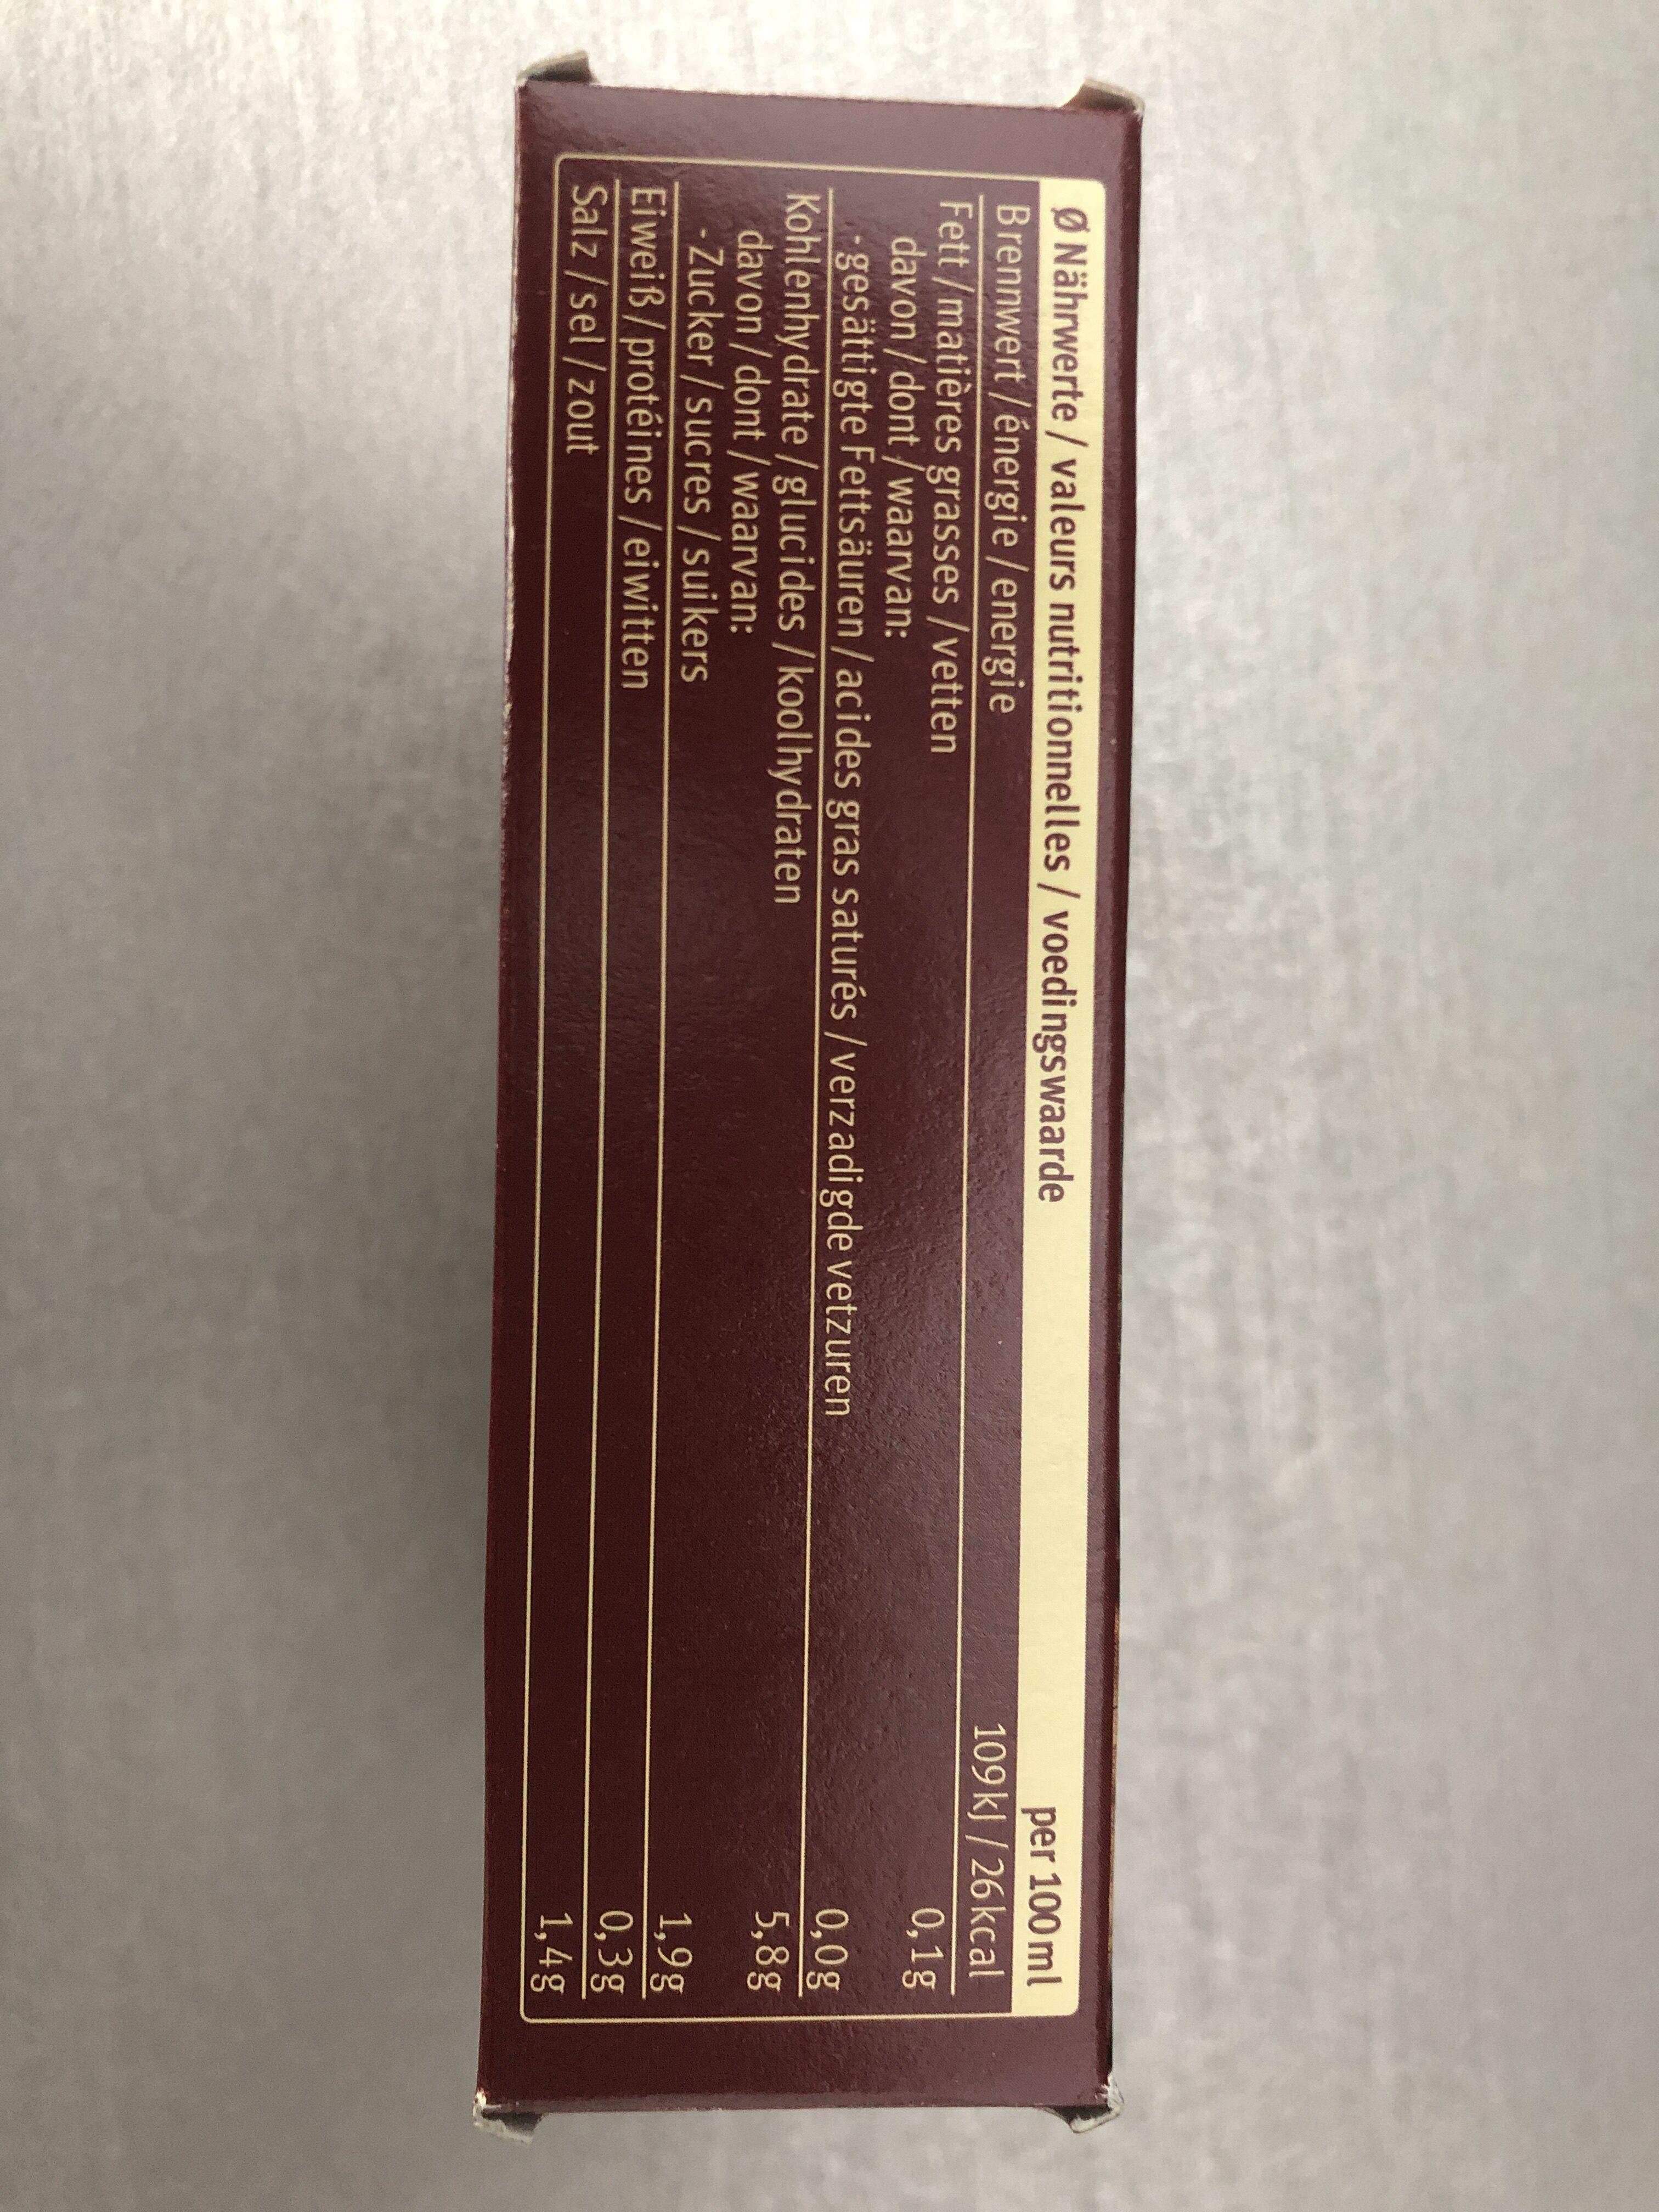 Dunkle Sauce - Informations nutritionnelles - fr